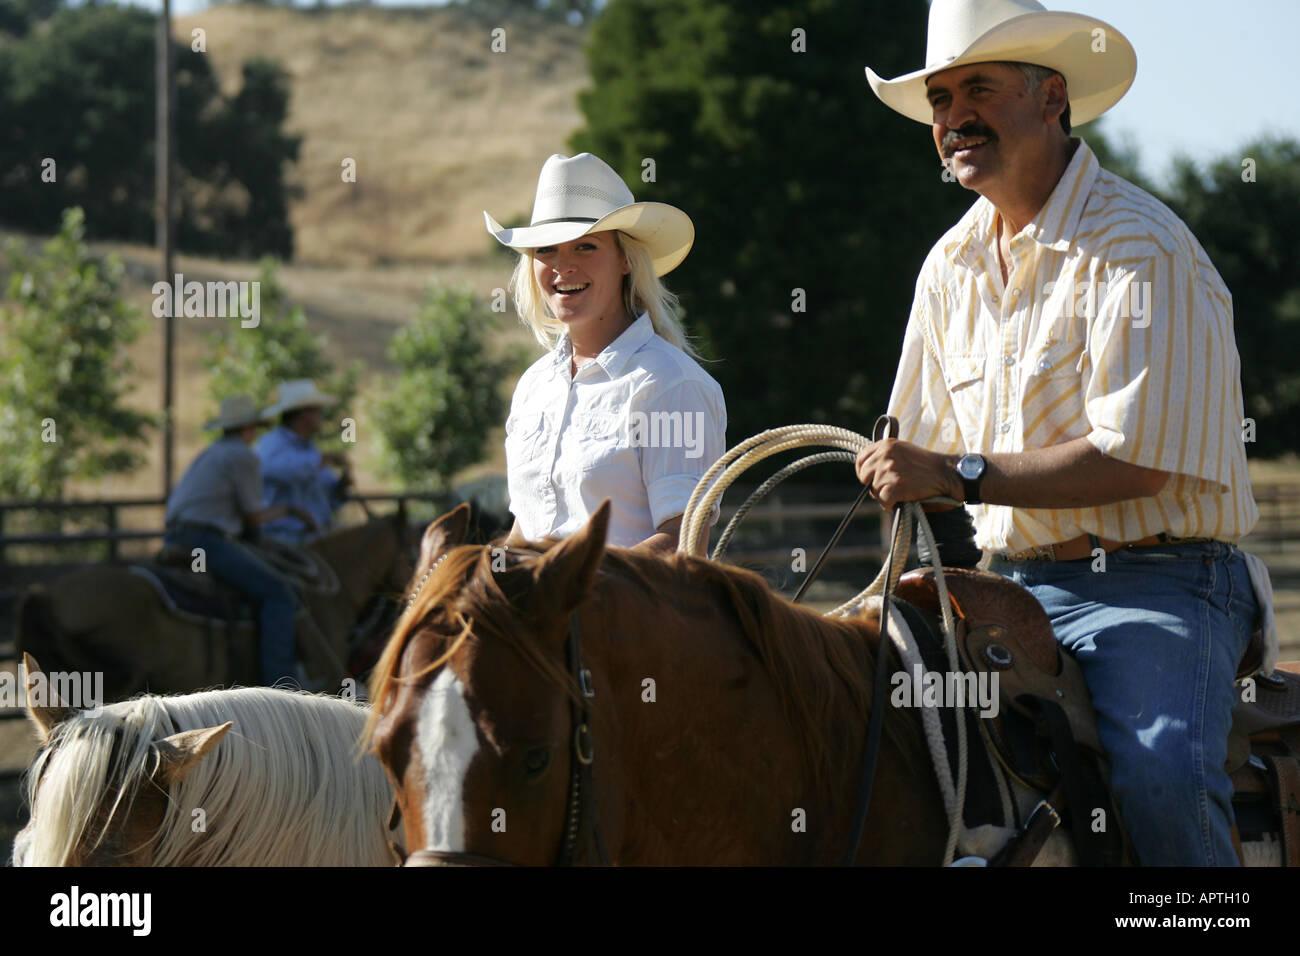 COWBOYS,CALIFORNIA,US,USA Stock Photo